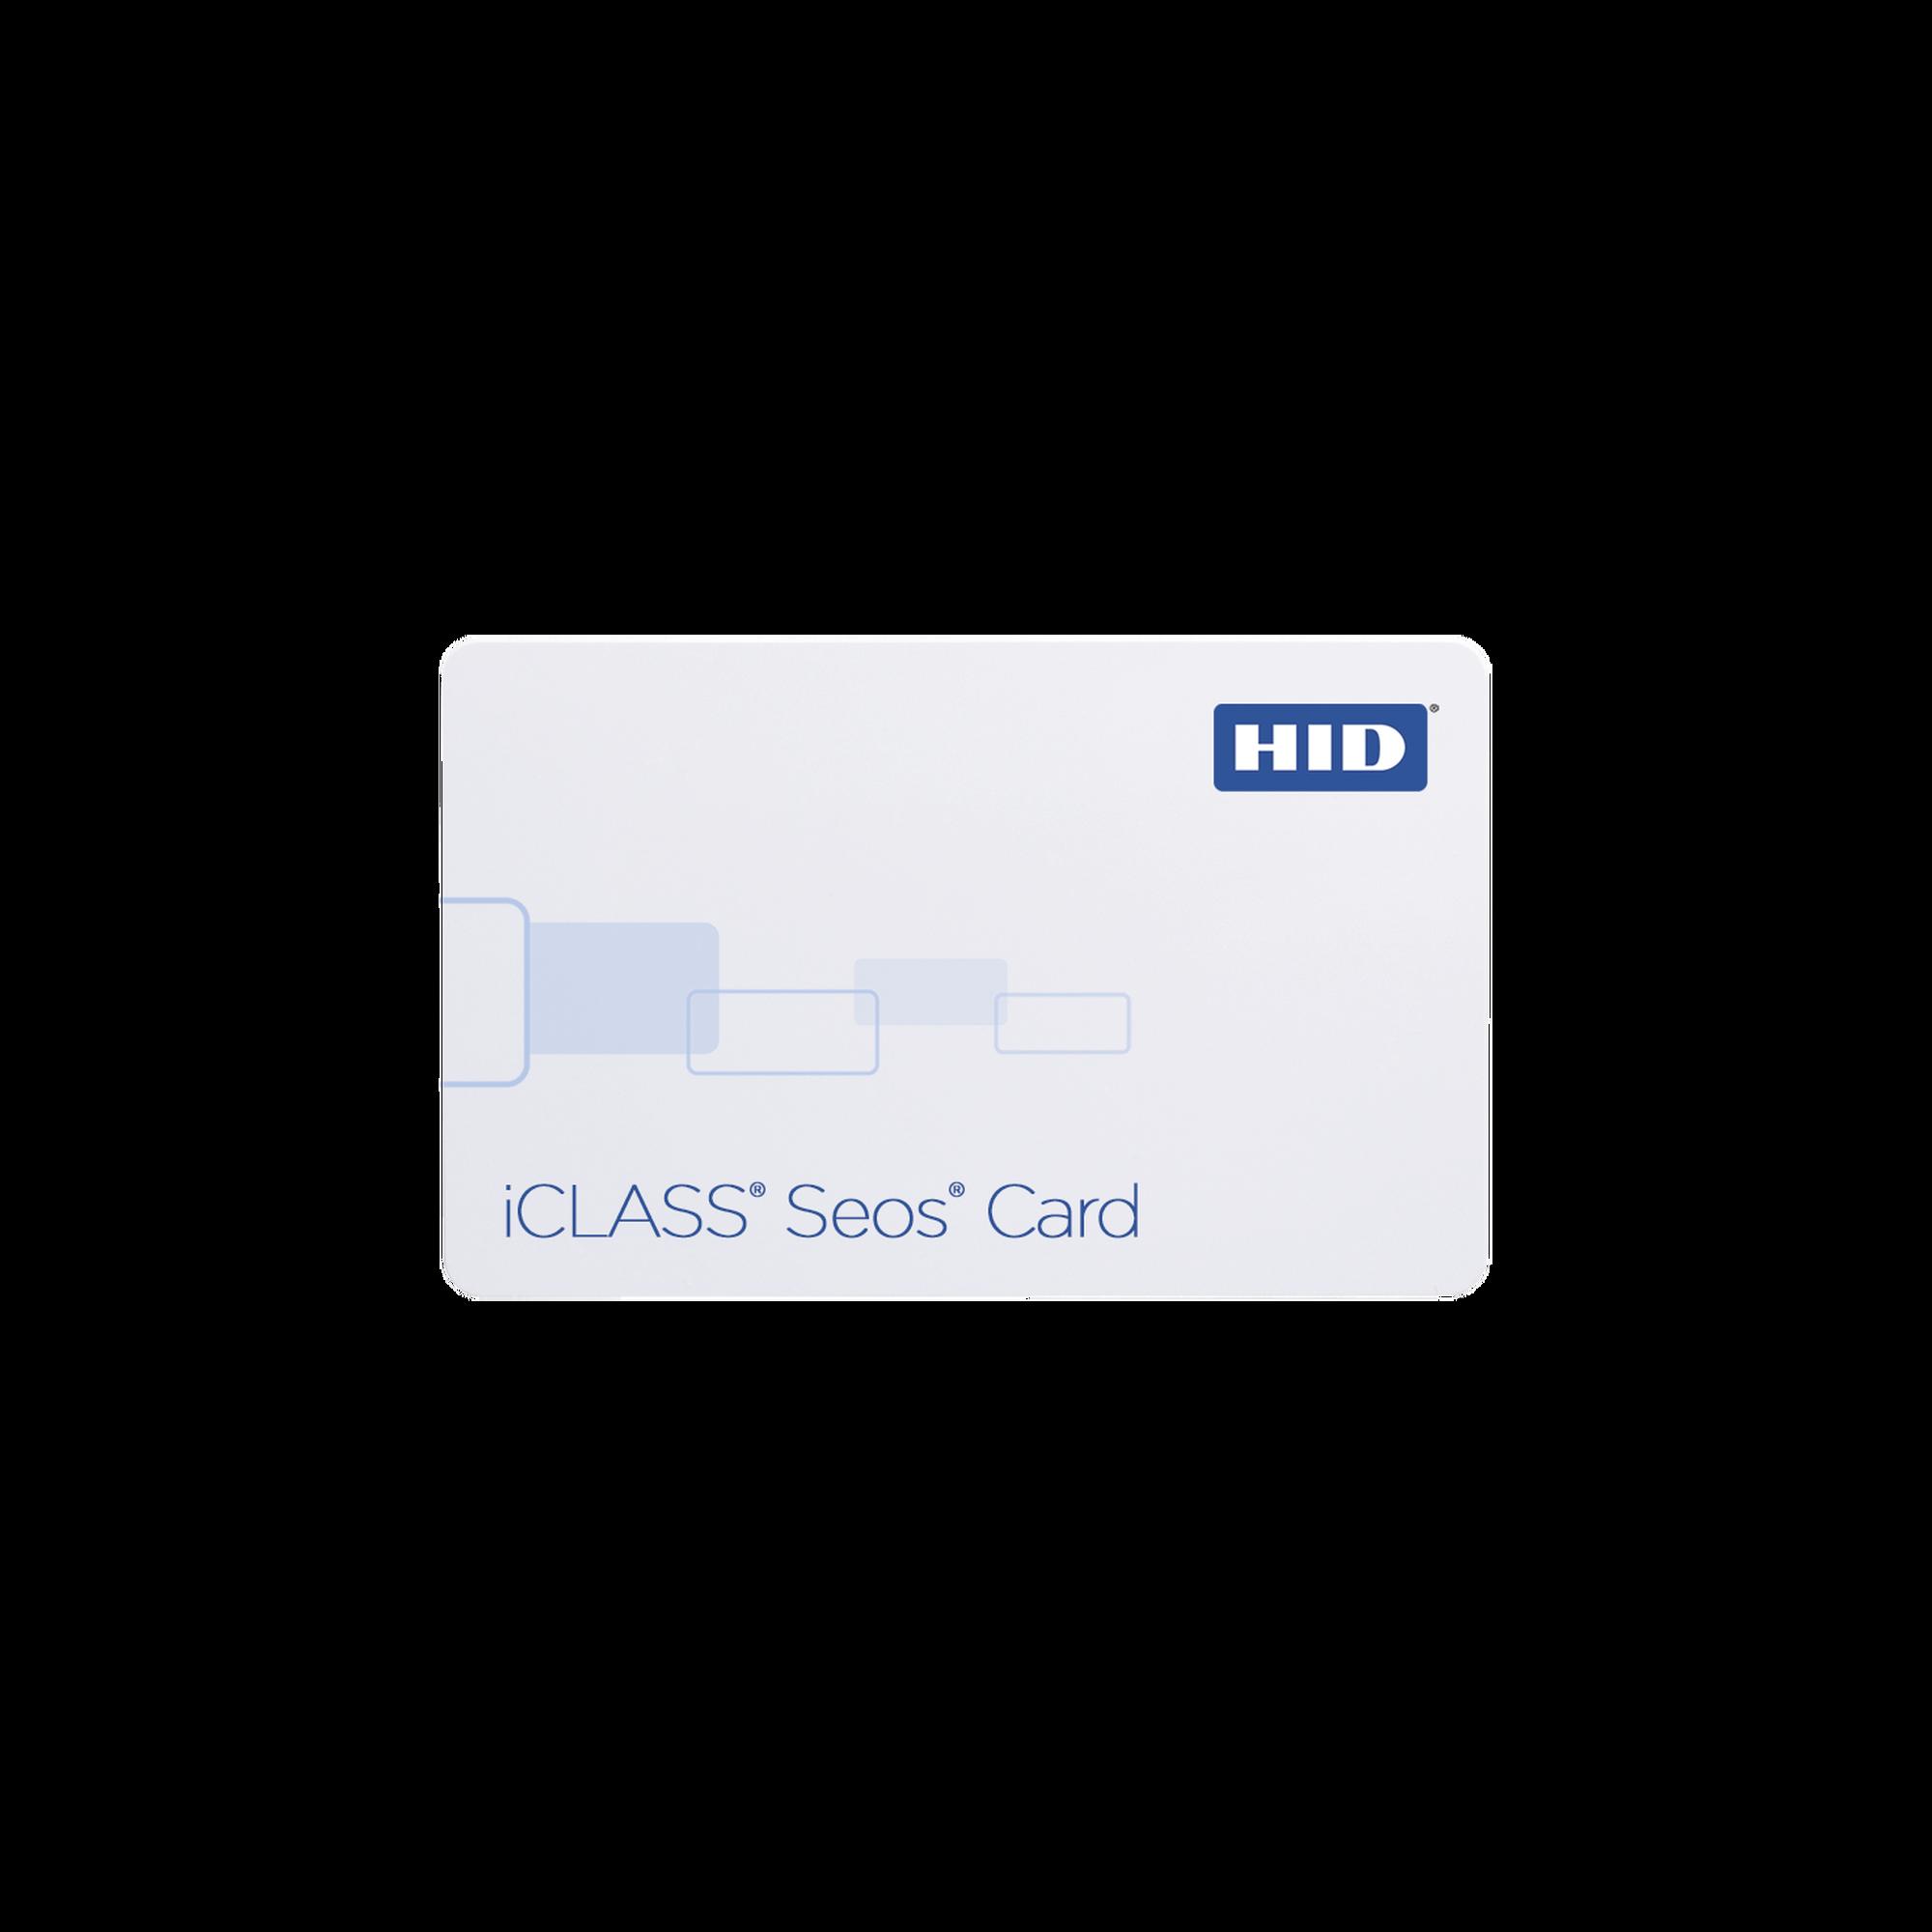 Tarjeta iCLASS SEOS 8KB (5006PGGMN) /Tecnología SEGURA, NO Clonable) / Garantía de por Vida/ 26 bits